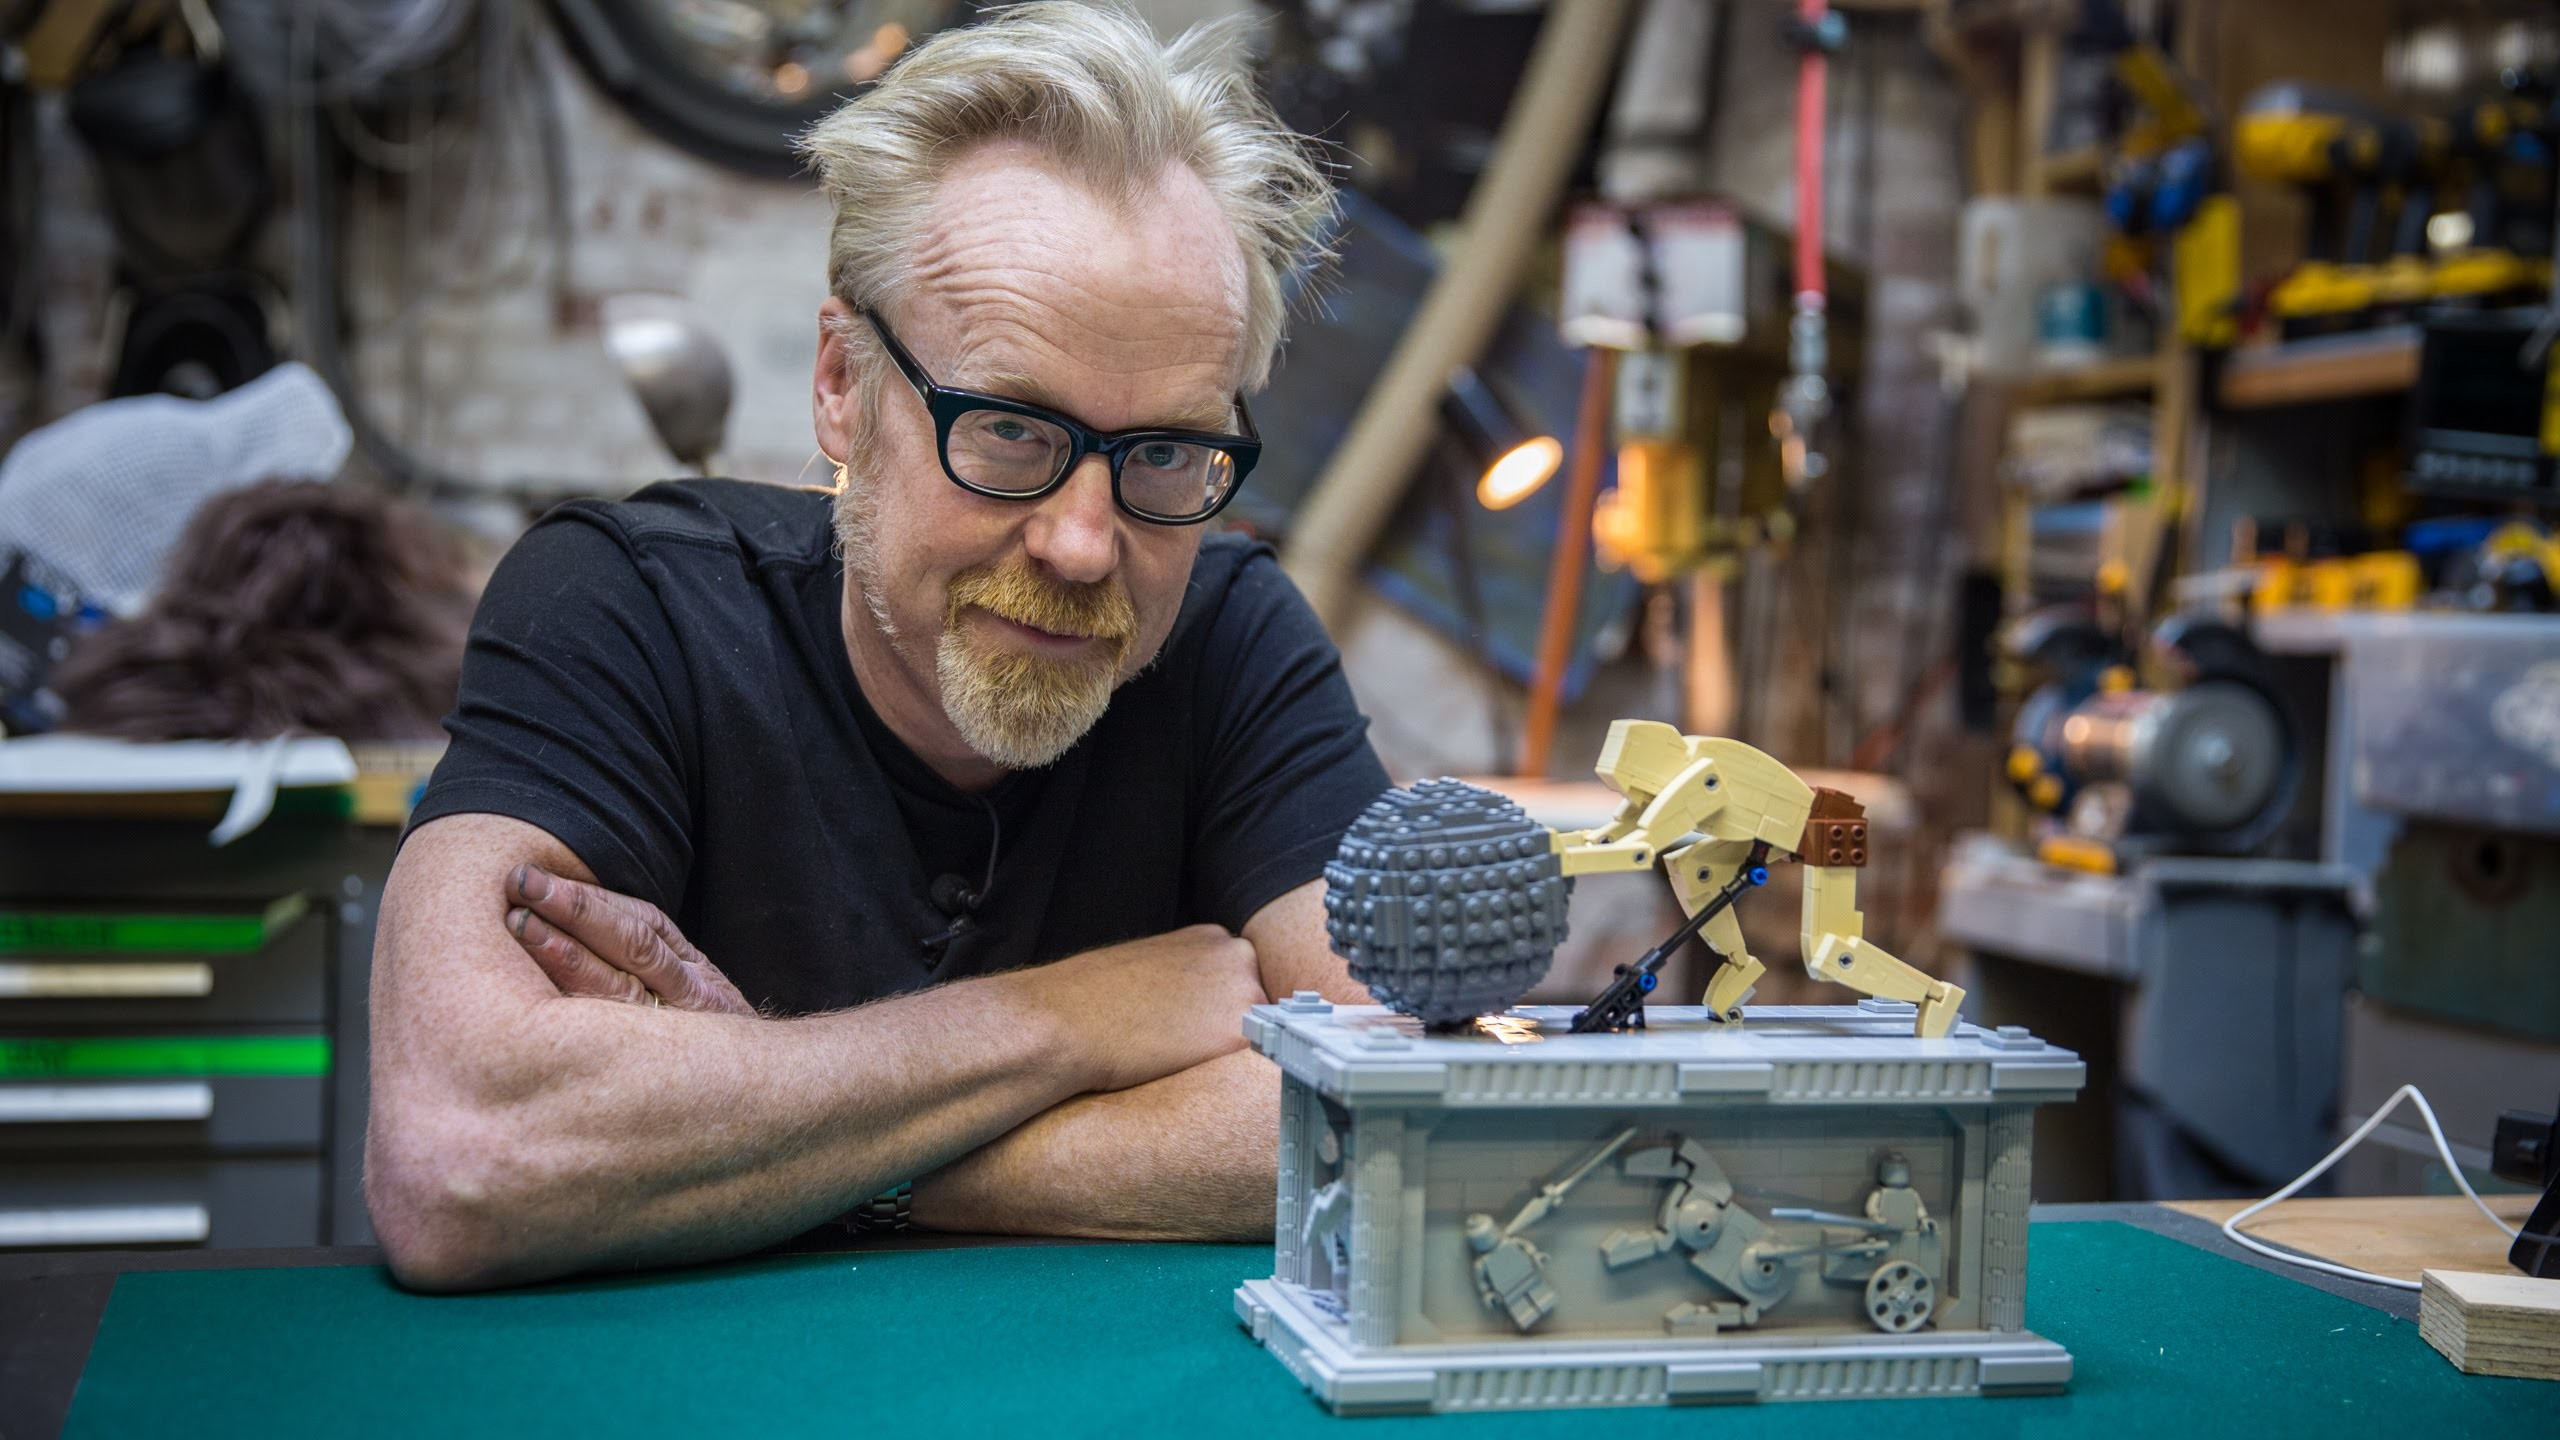 Adam Savage's One Day Builds: LEGO Sisyphus Automata!